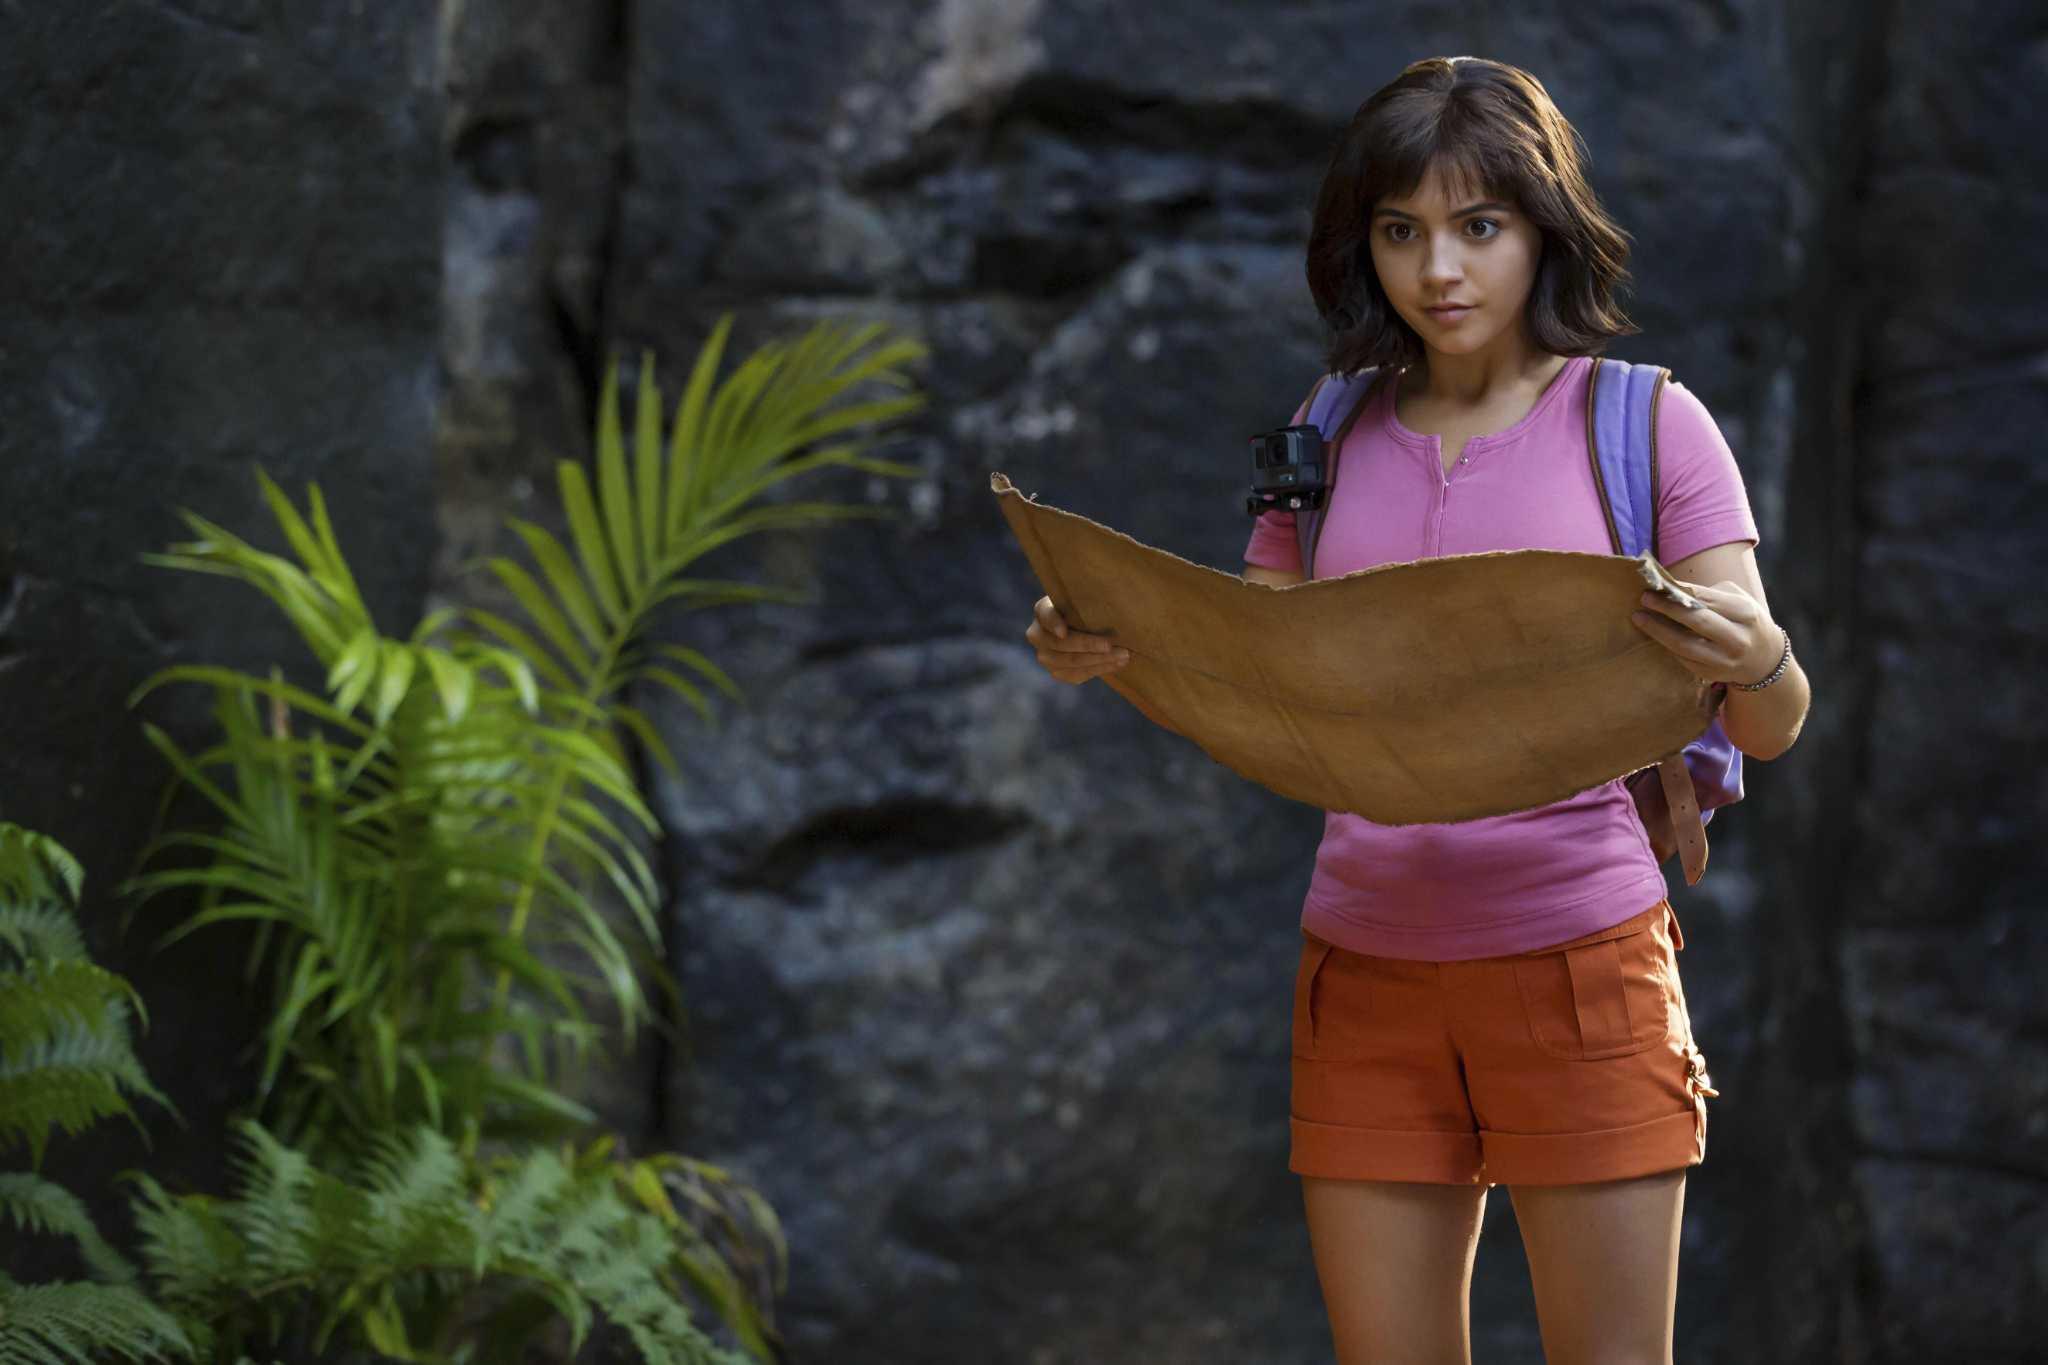 Now streaming: Dora the Explorer movie on digital today